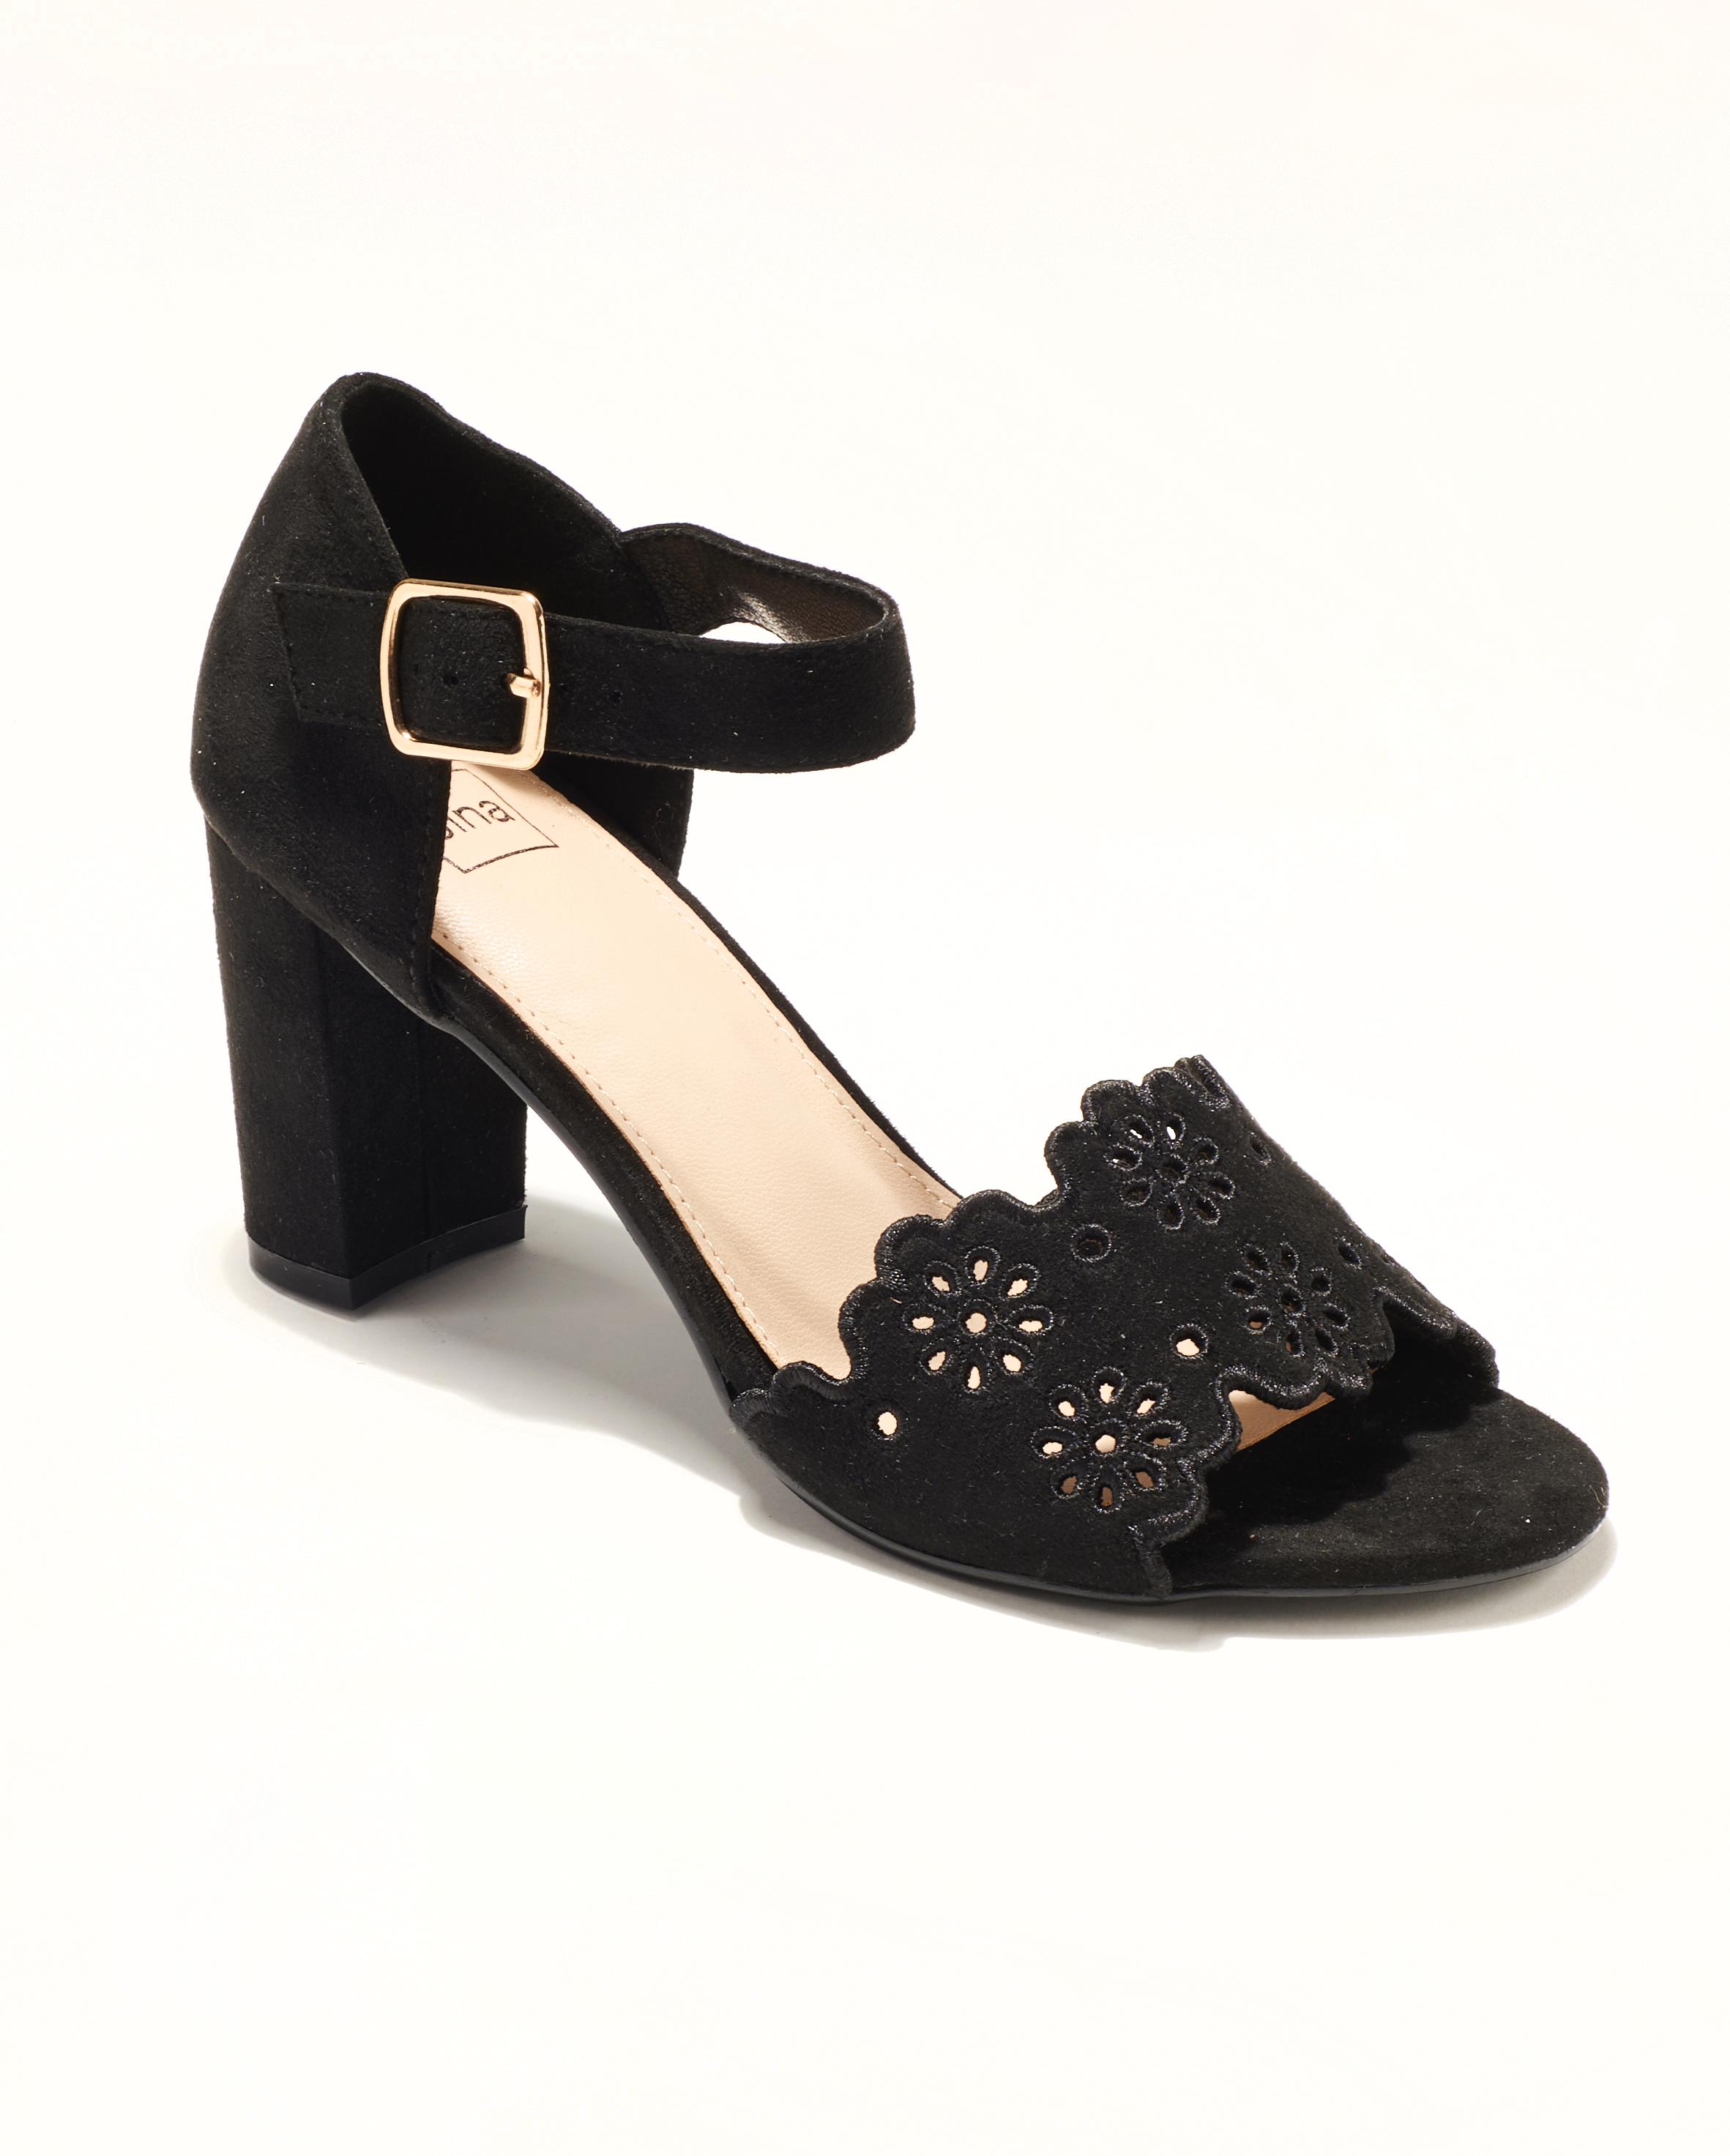 Sandales À Talons Femme - Sandale Talon Decrochee Noir Jina - Mgpt28-1-J21a